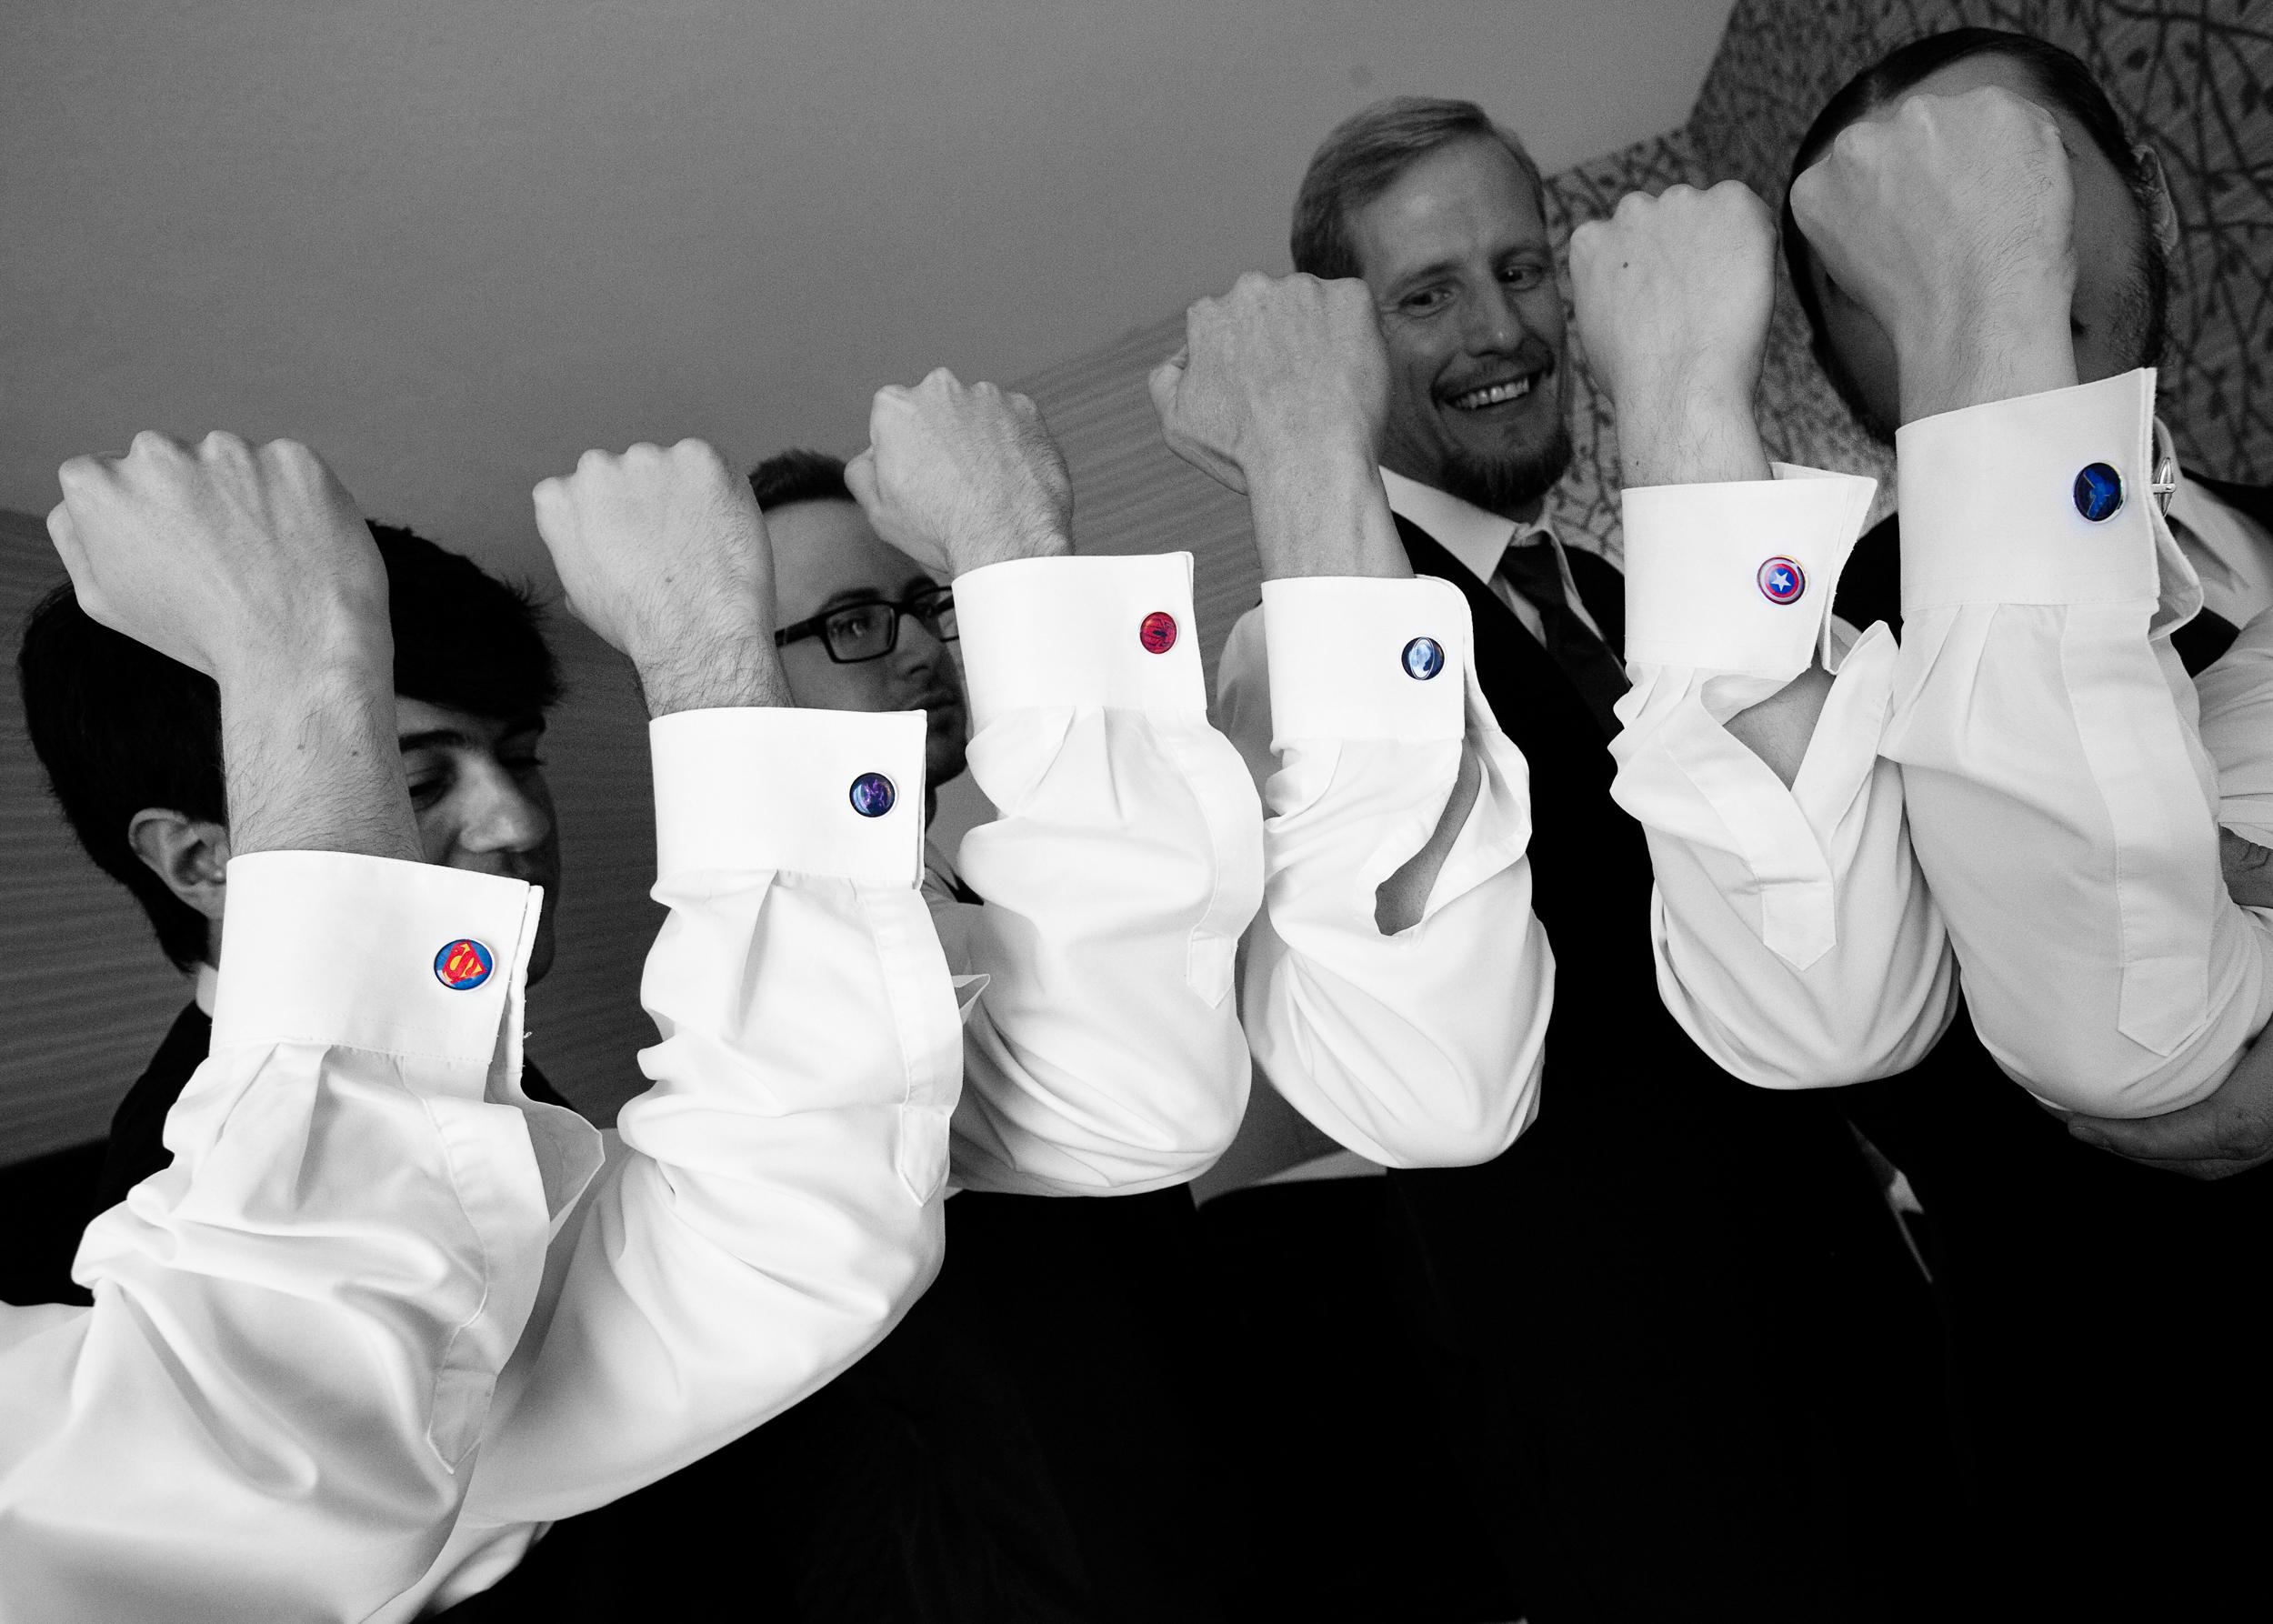 gibson_guitars_cuff_links_men_wedding_groomsmen_groom_cufflinks_3.jpg